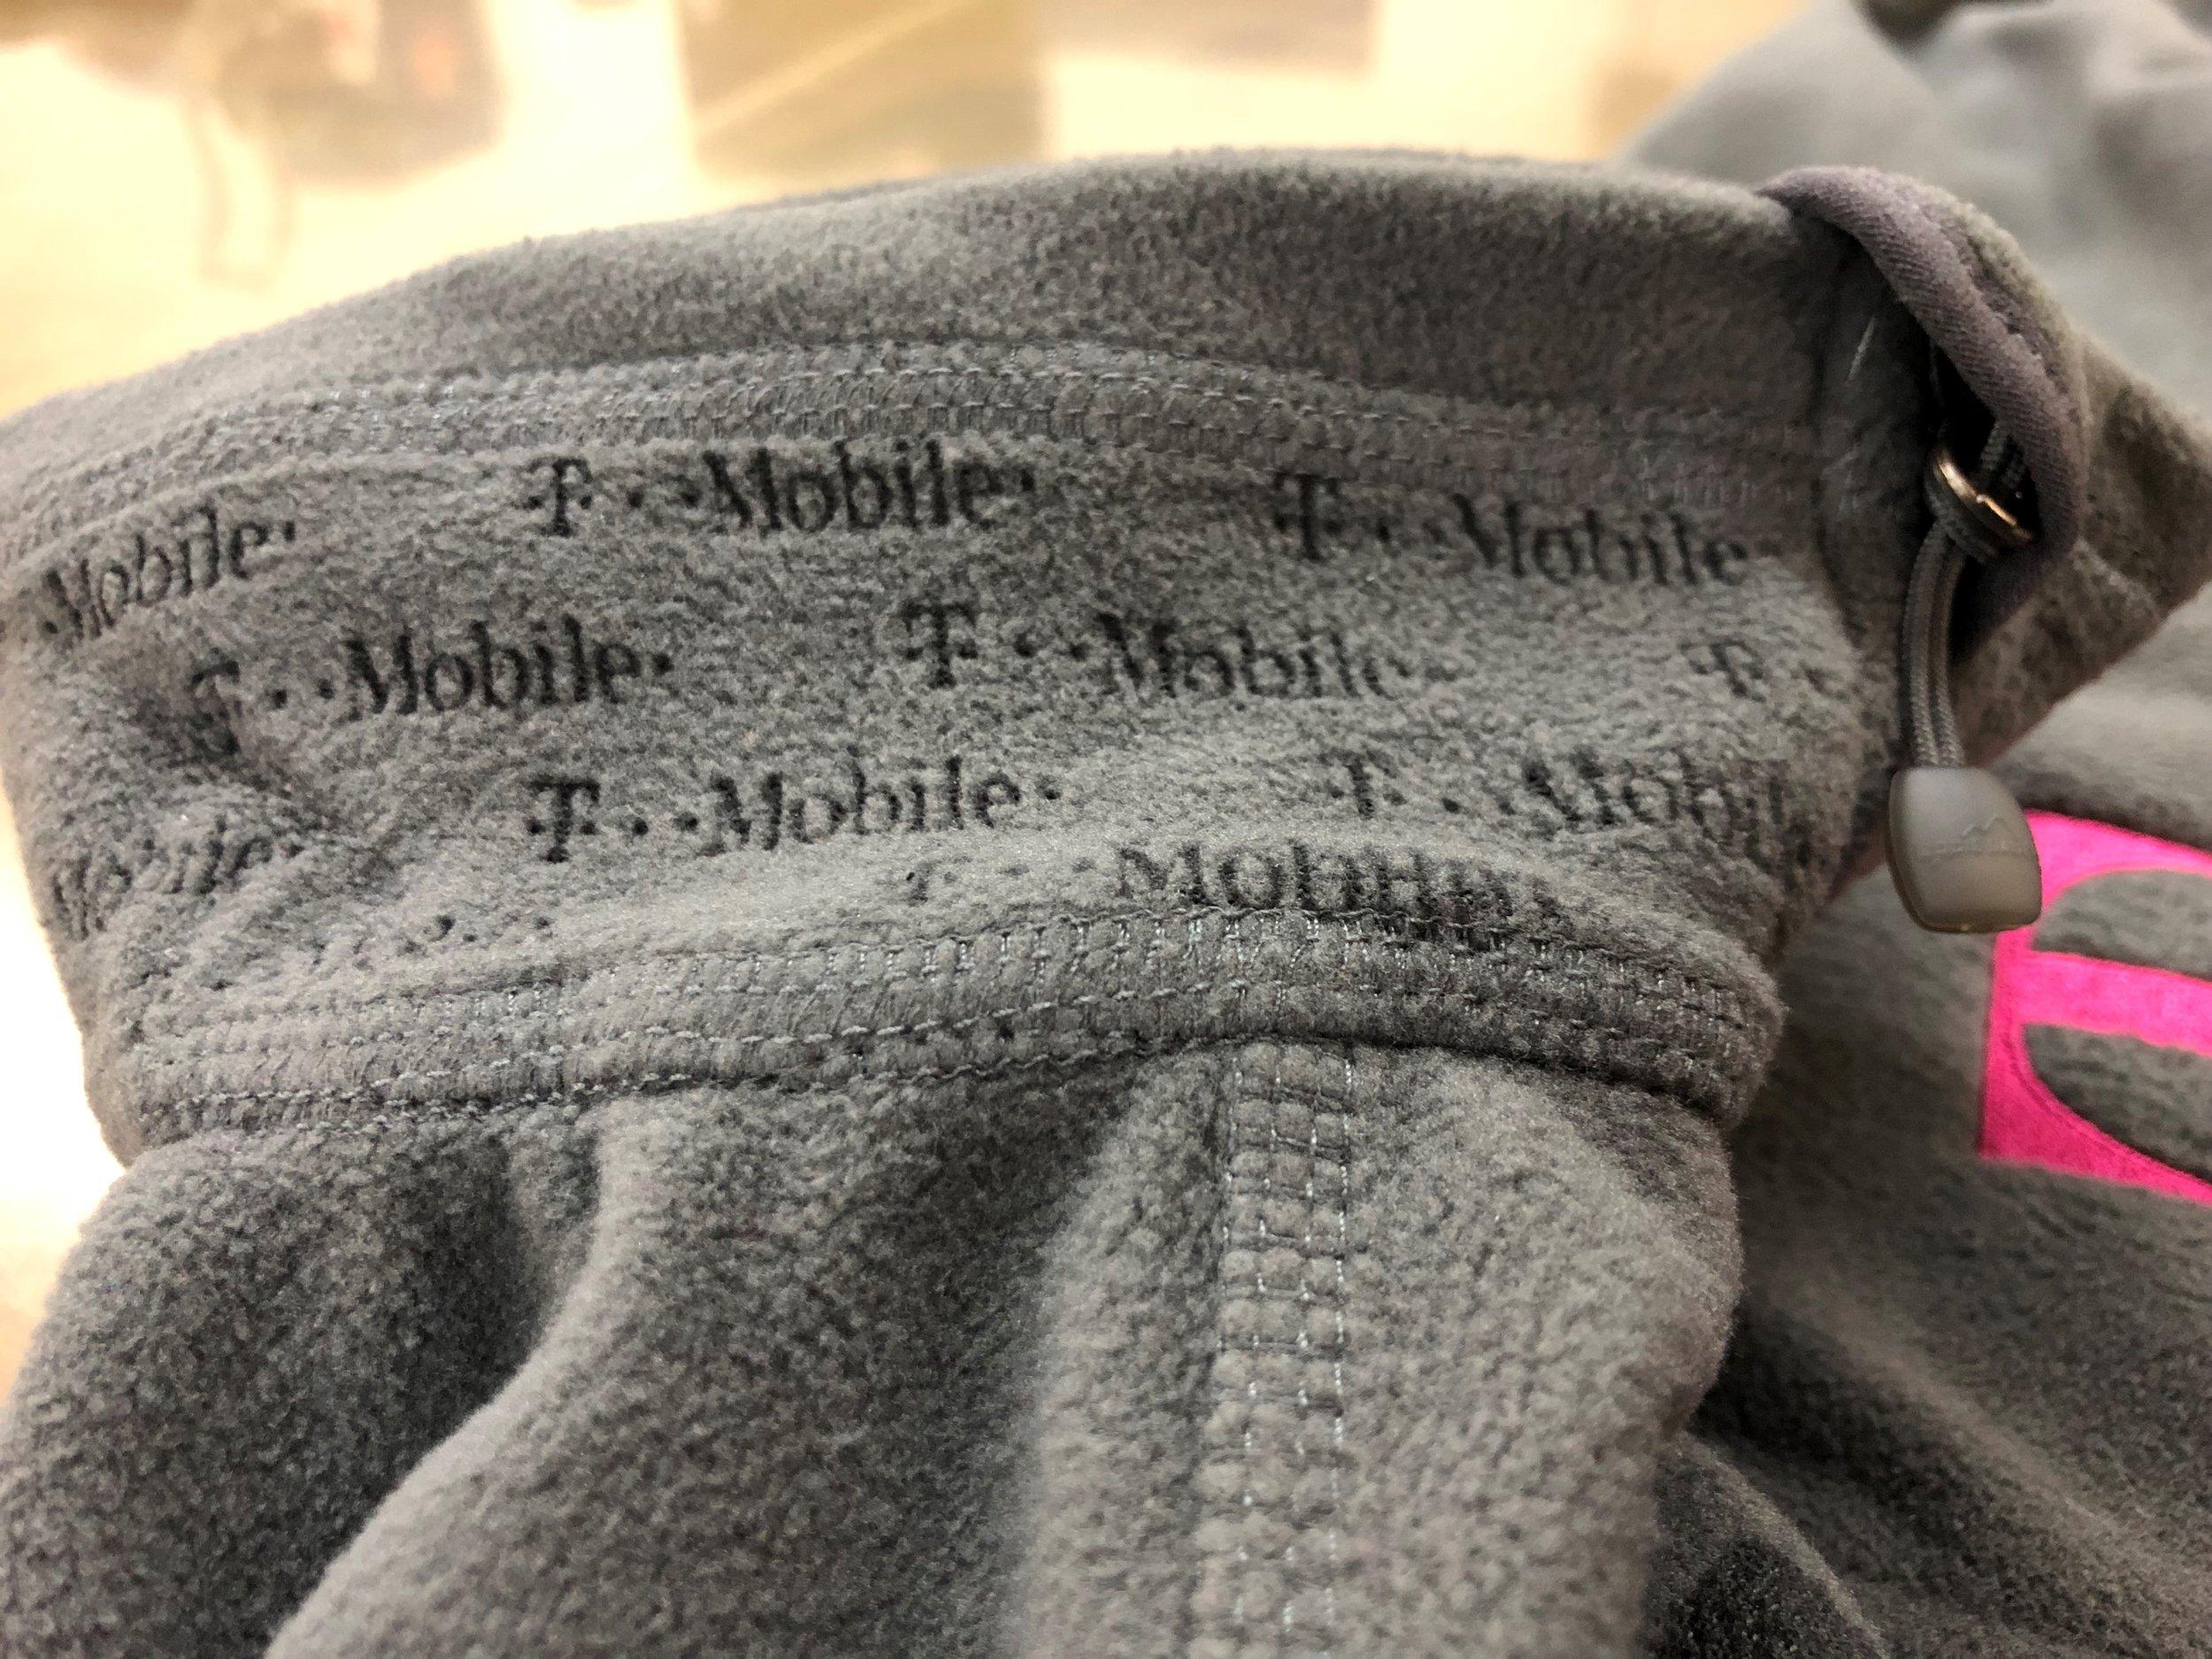 Laser Etched Collar on Fleece Jacket for T-Mobile